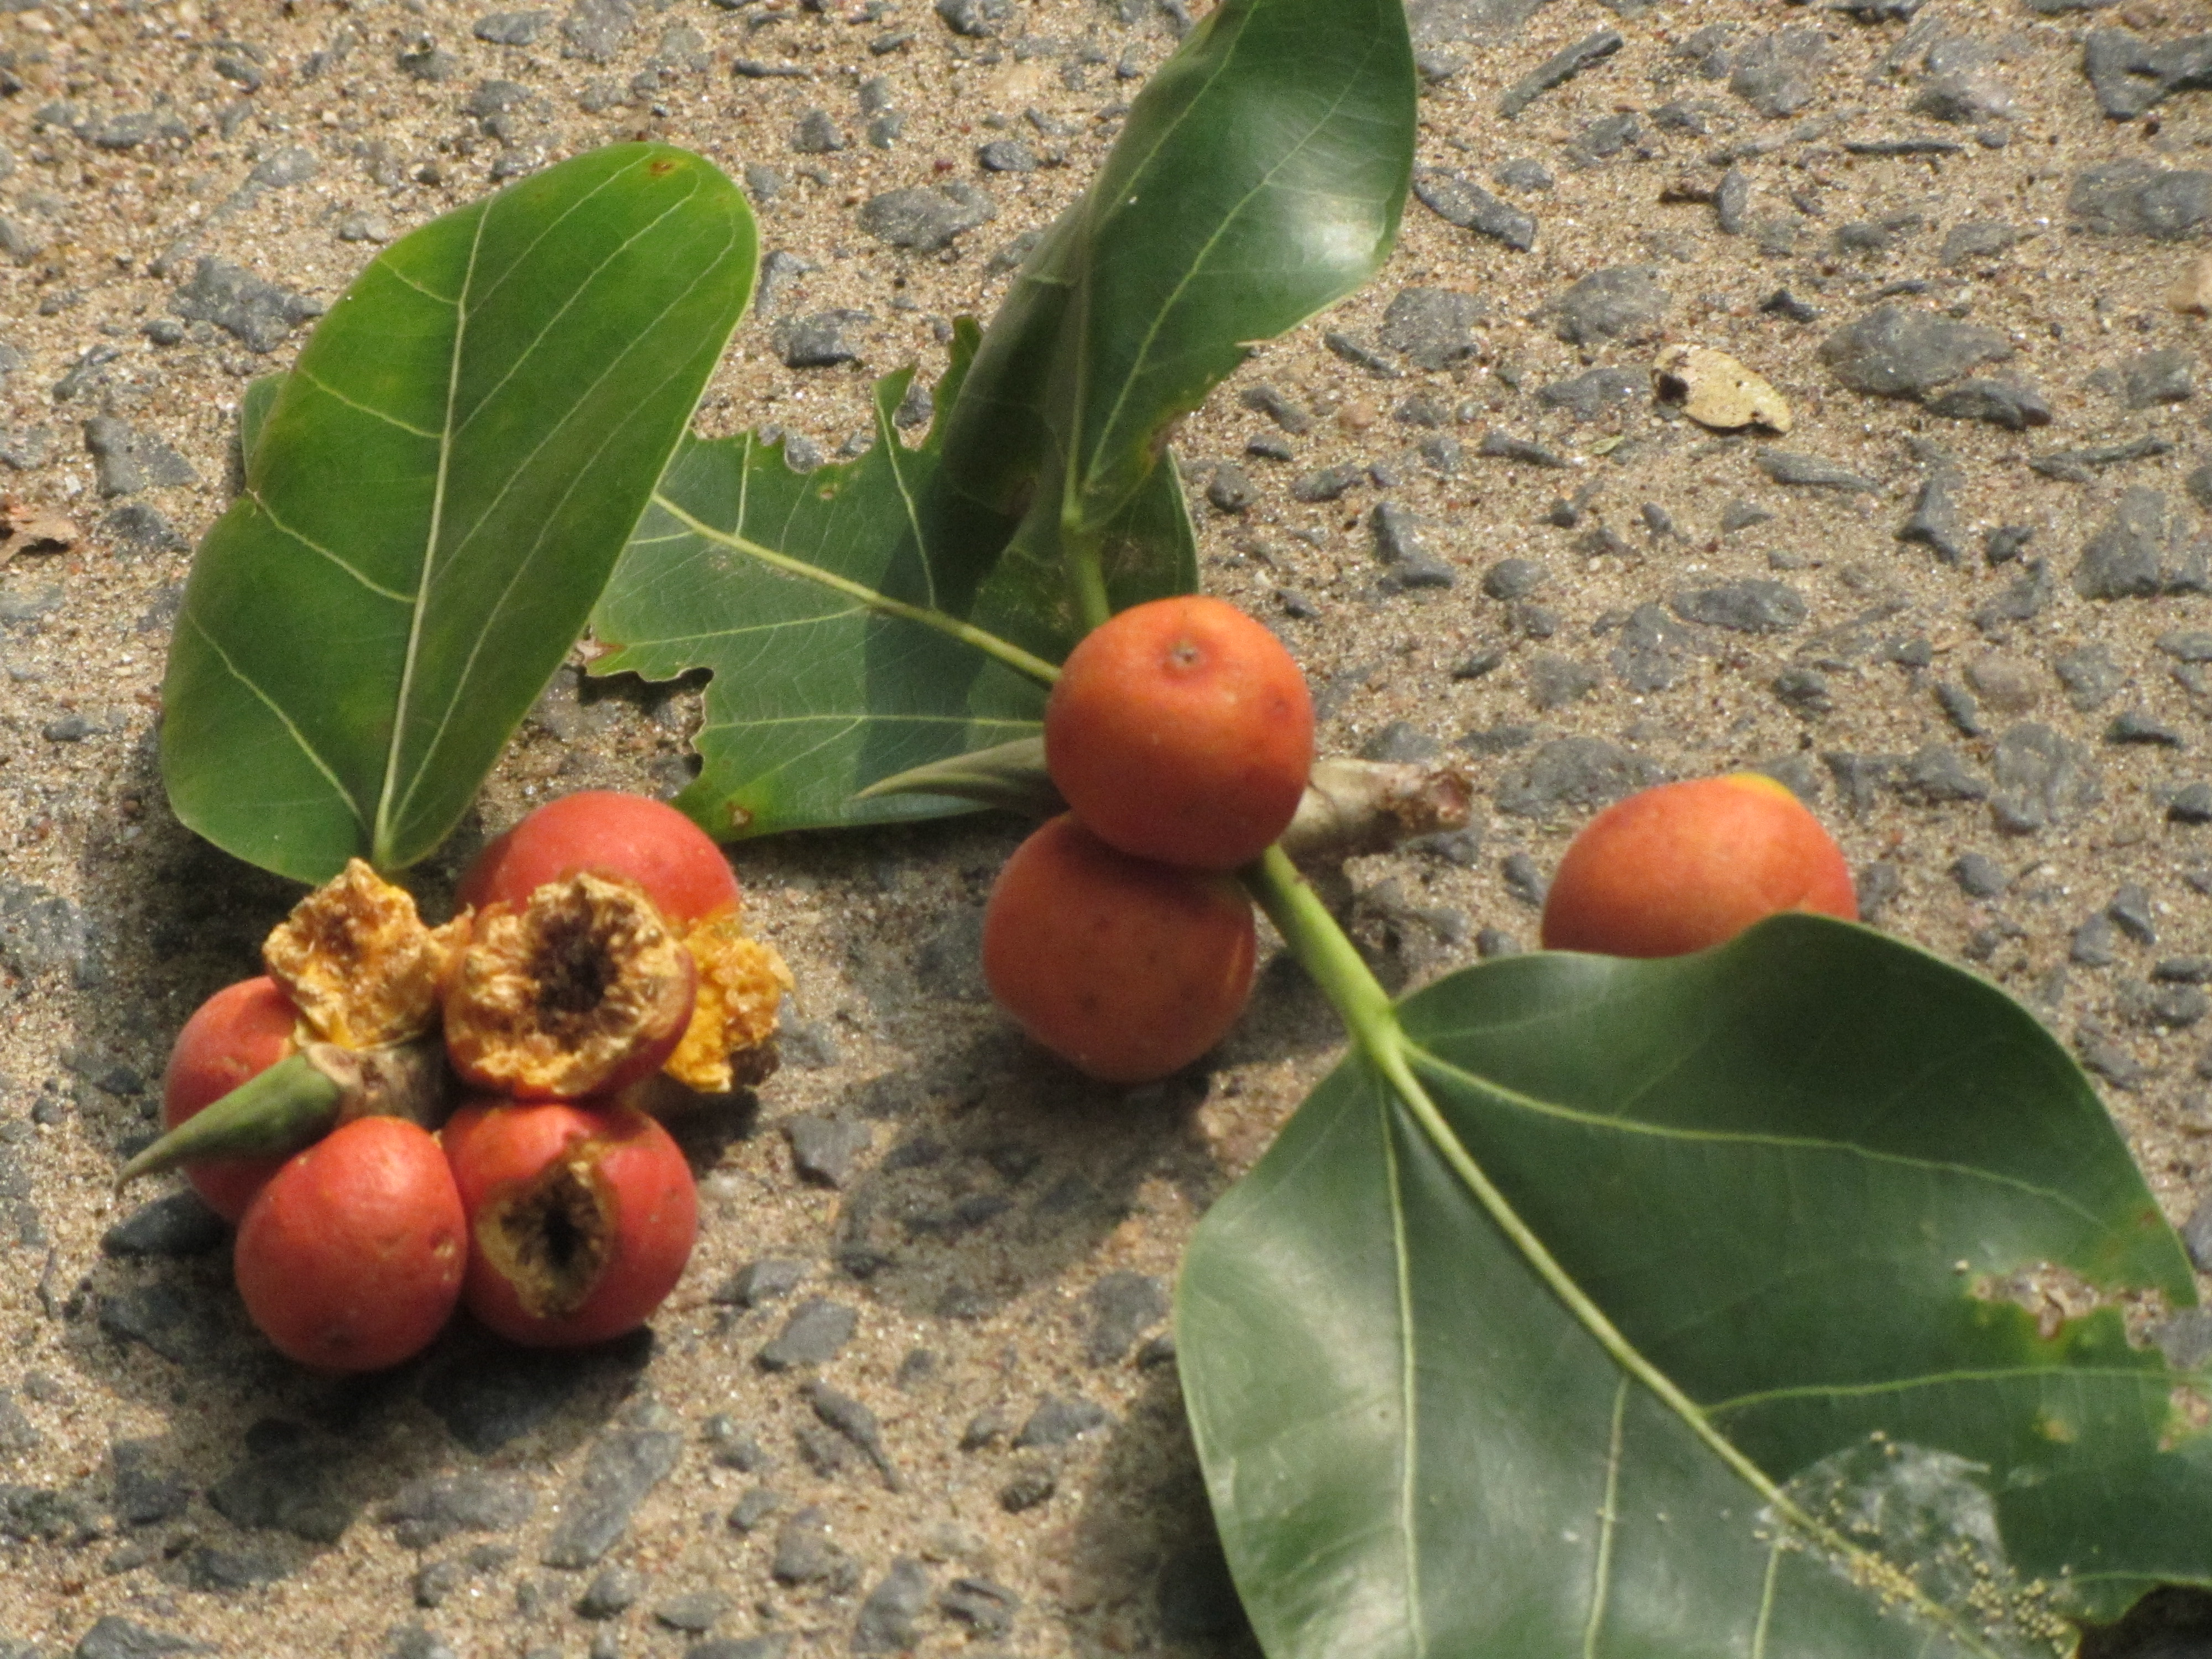 File:Fruits of banyan tree JPG - Wikimedia Commons